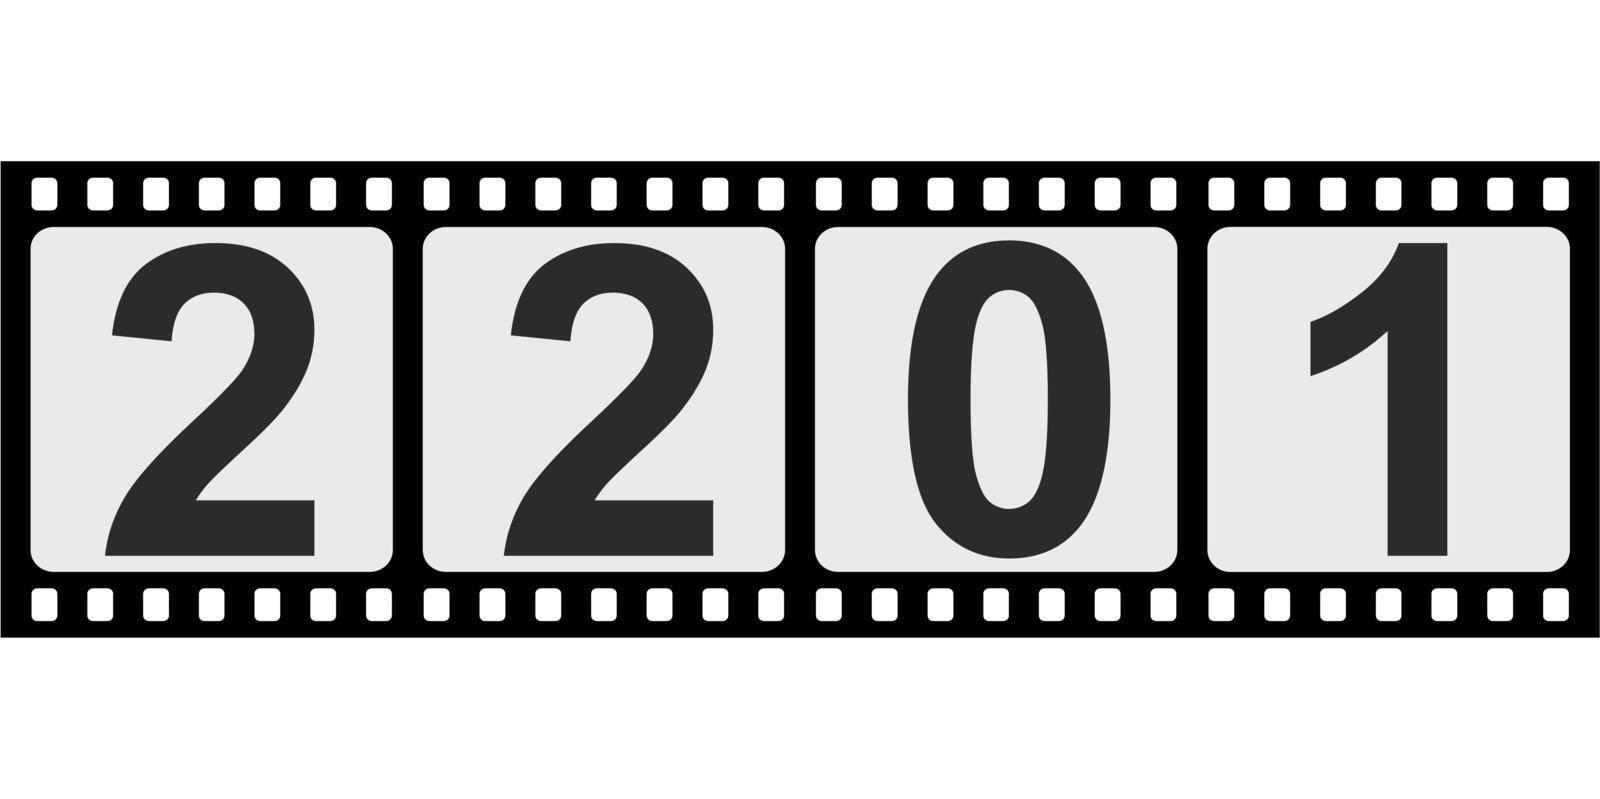 banner 2021 happy new year retro style, photo film slide vector photo film negative slide 2021 by koksikoks